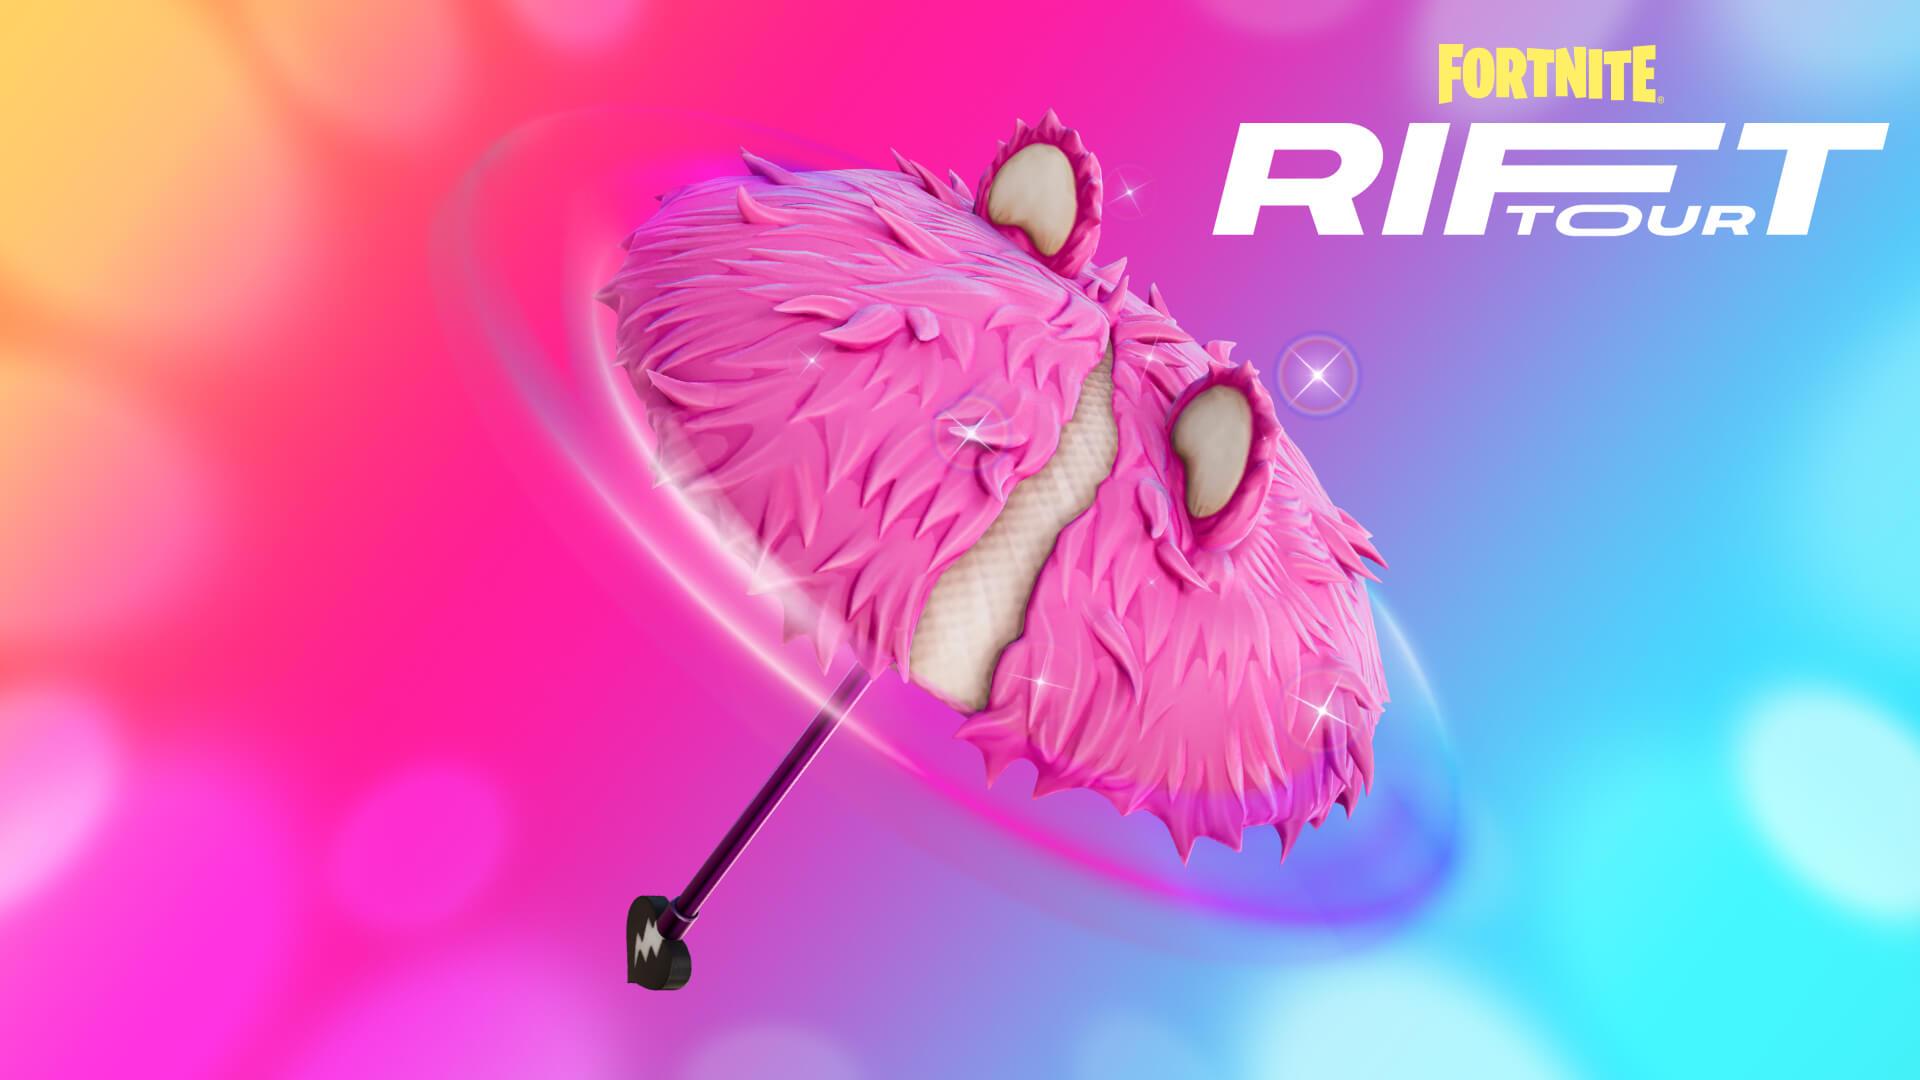 EN 17BR RiftTour Umbrella Social